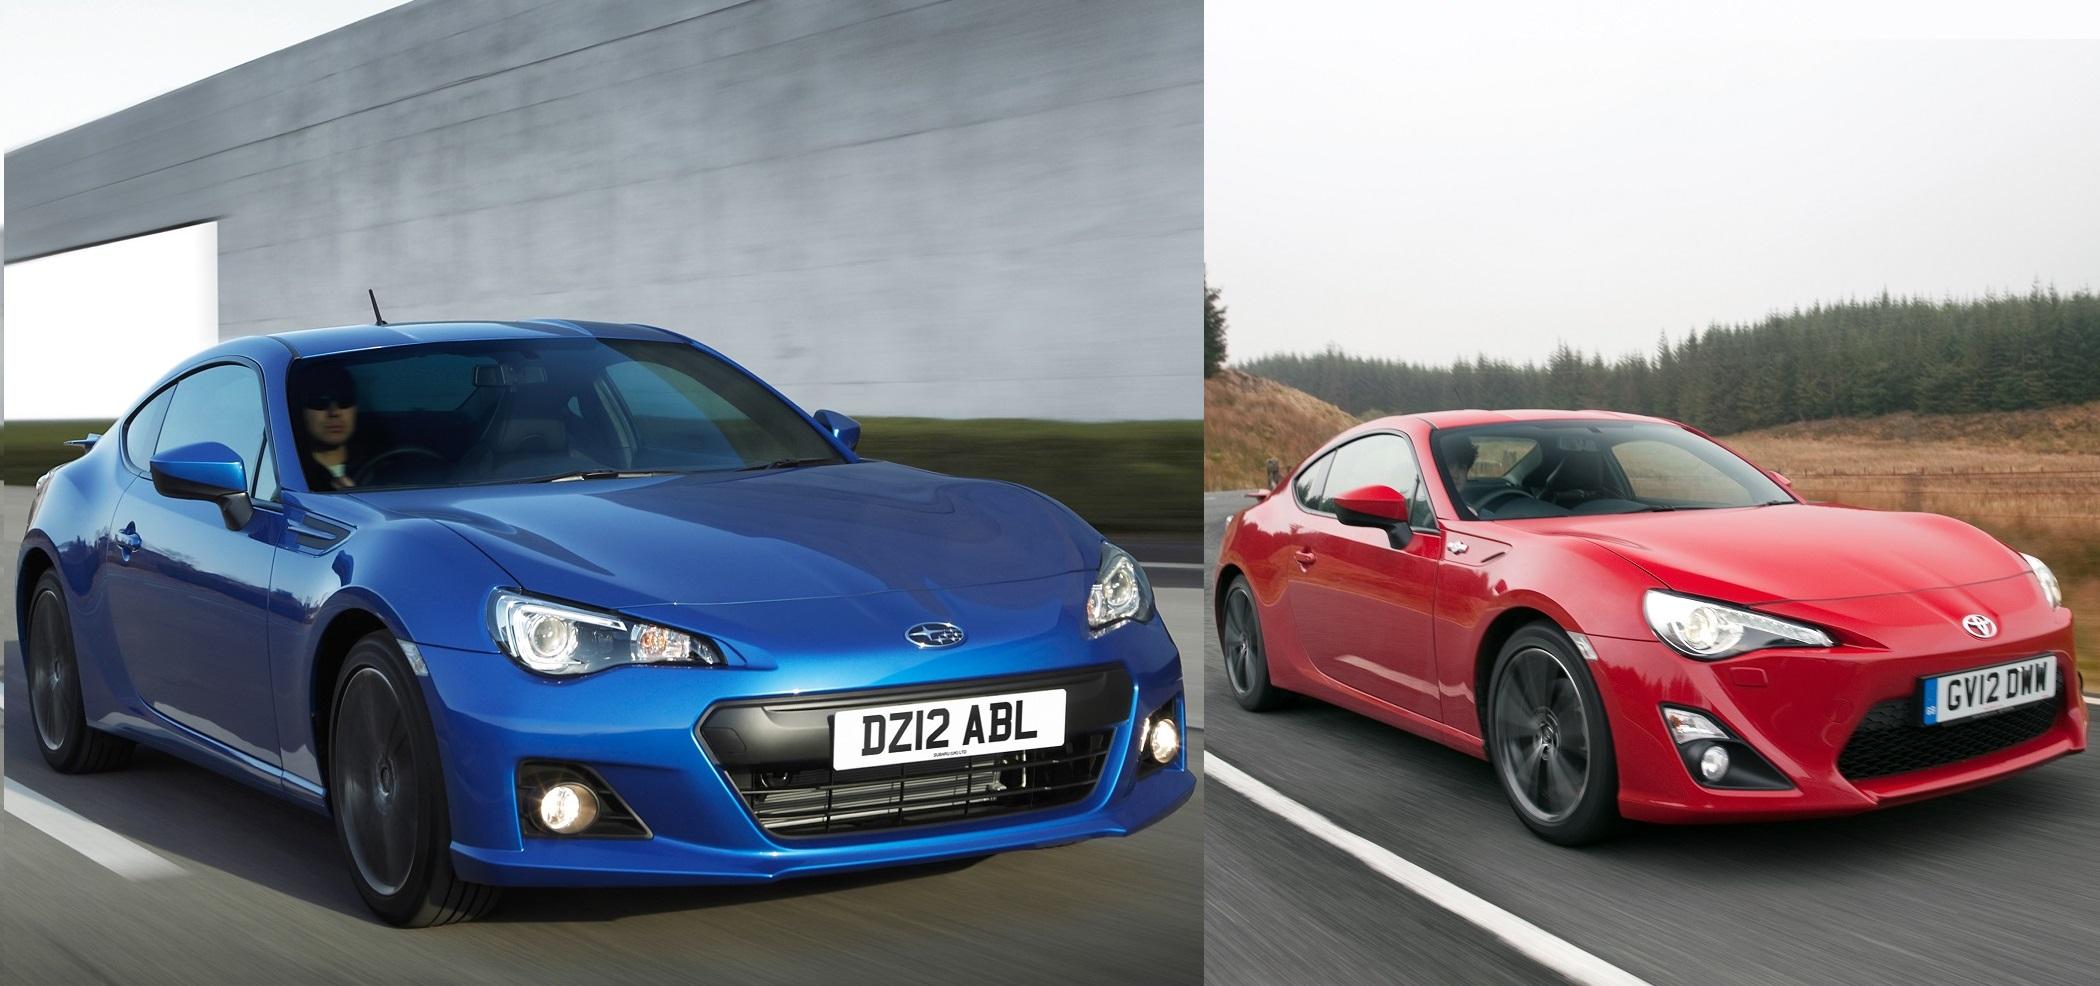 Subaru brz vs toyota gt86 jpg